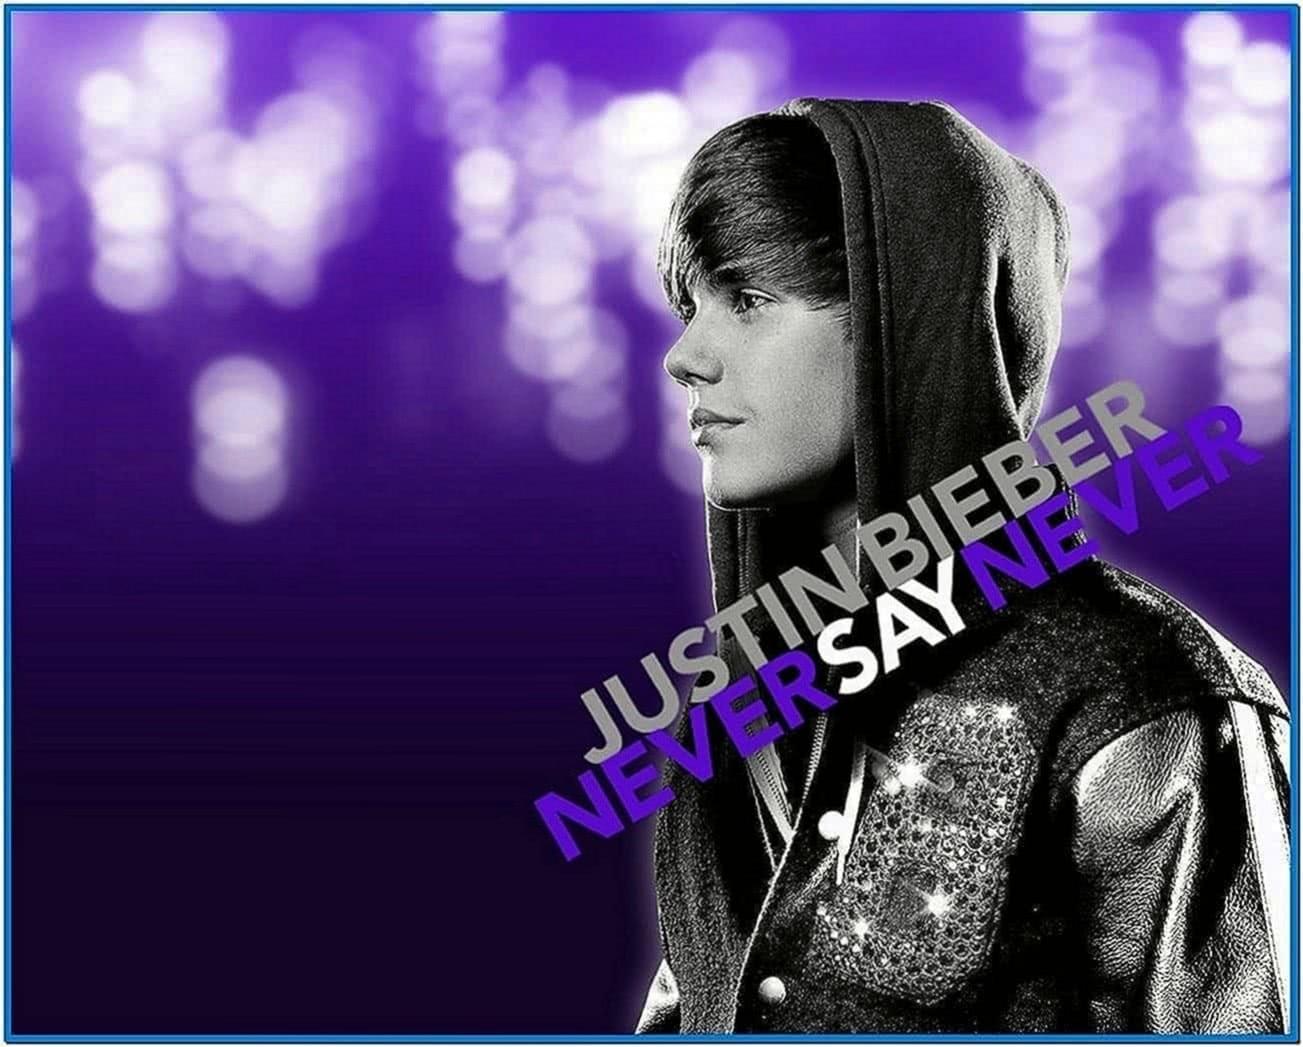 Justin Bieber Wallpaper Screensaver